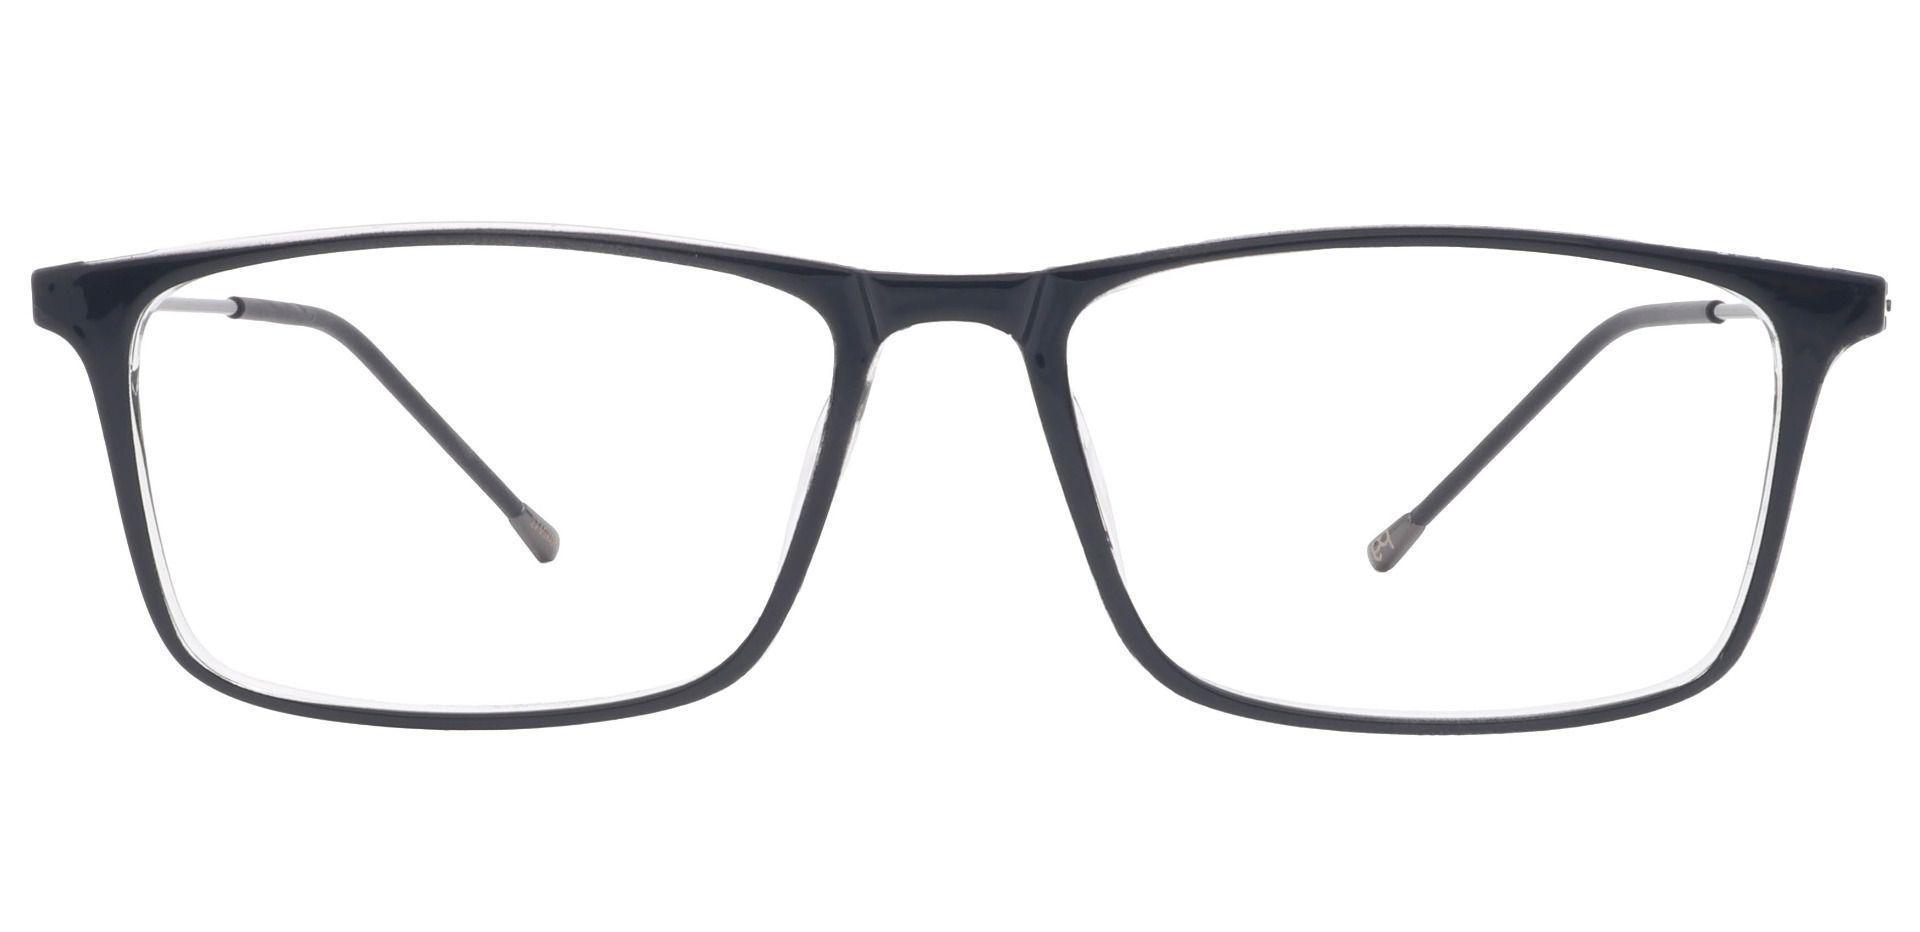 Finley Rectangle Prescription Glasses - Black